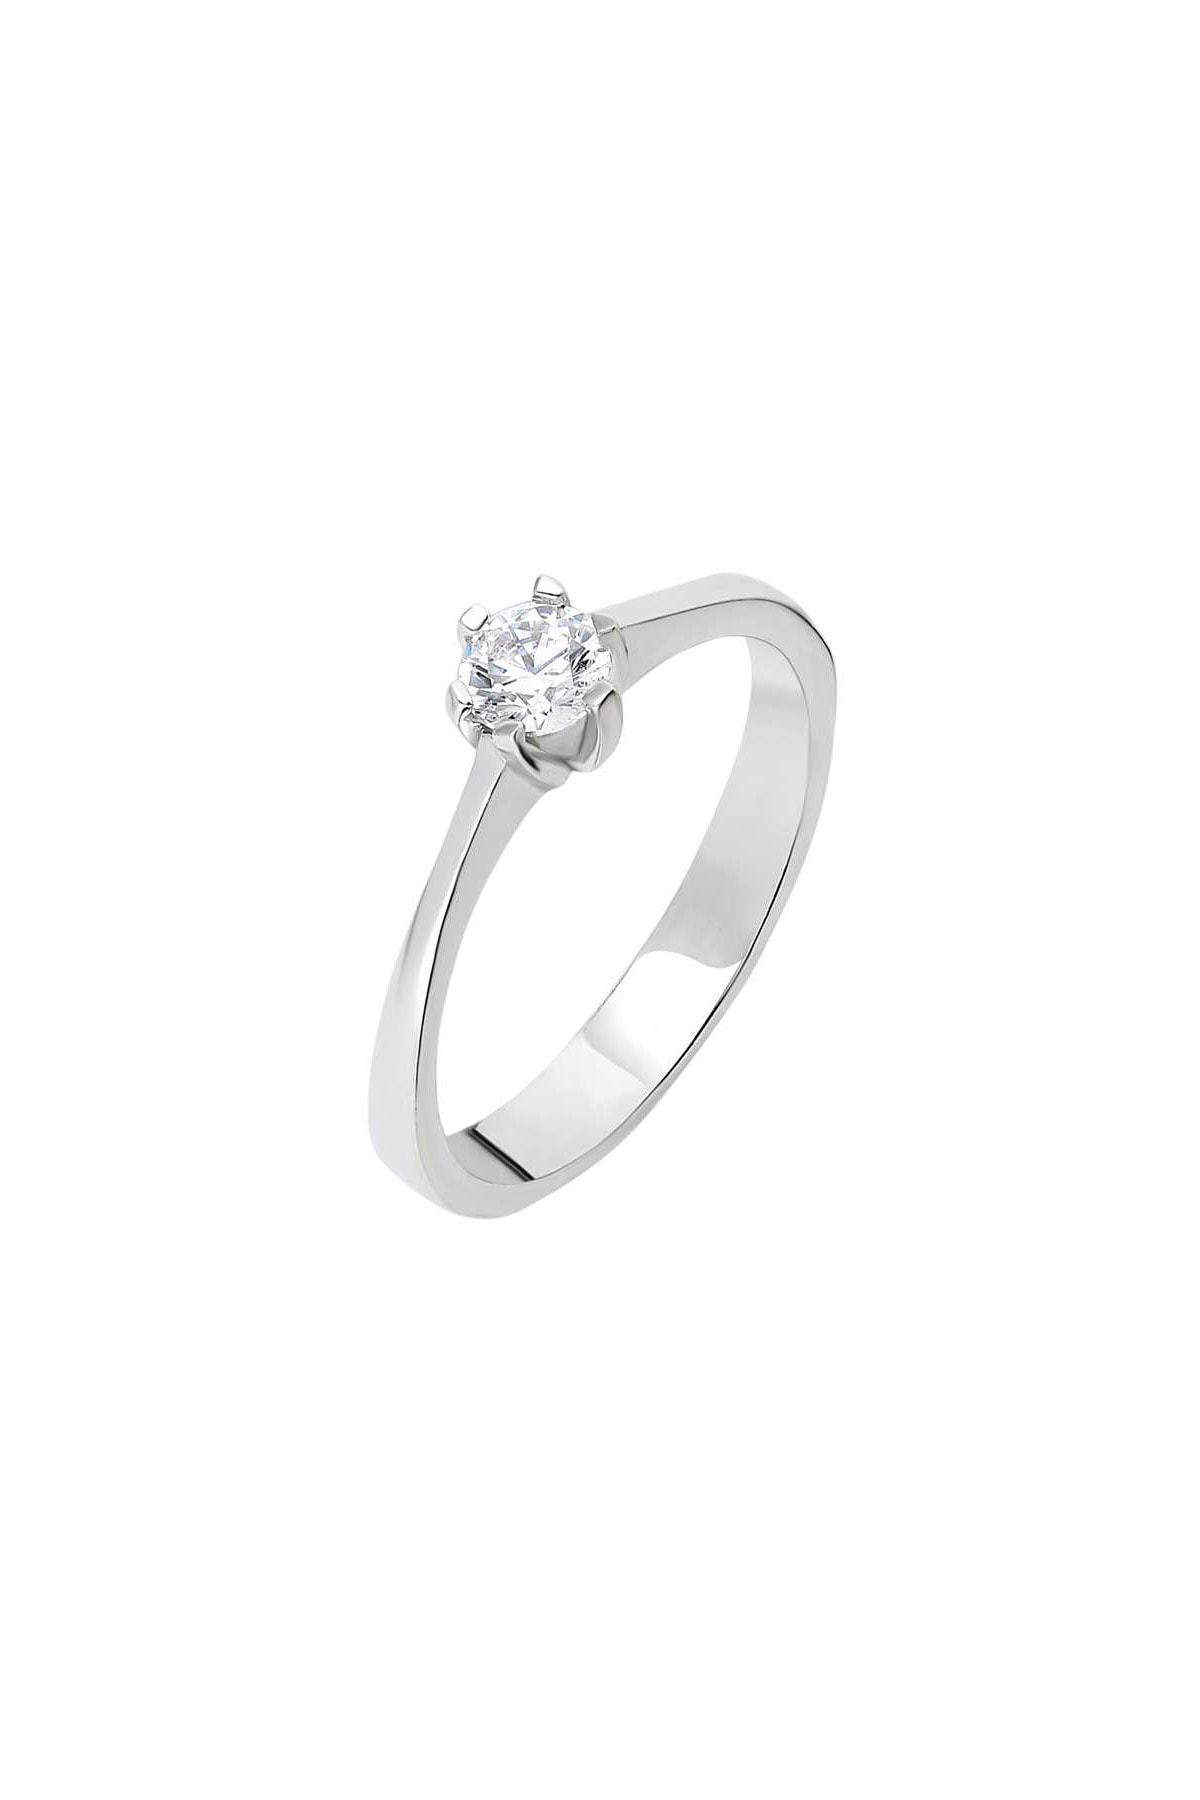 Tesbihane Starlight Diamond Pırlanta Montür Oval Tasarım 925 Ayar Gümüş Bayan Tektaş Yüzük 102001791 3